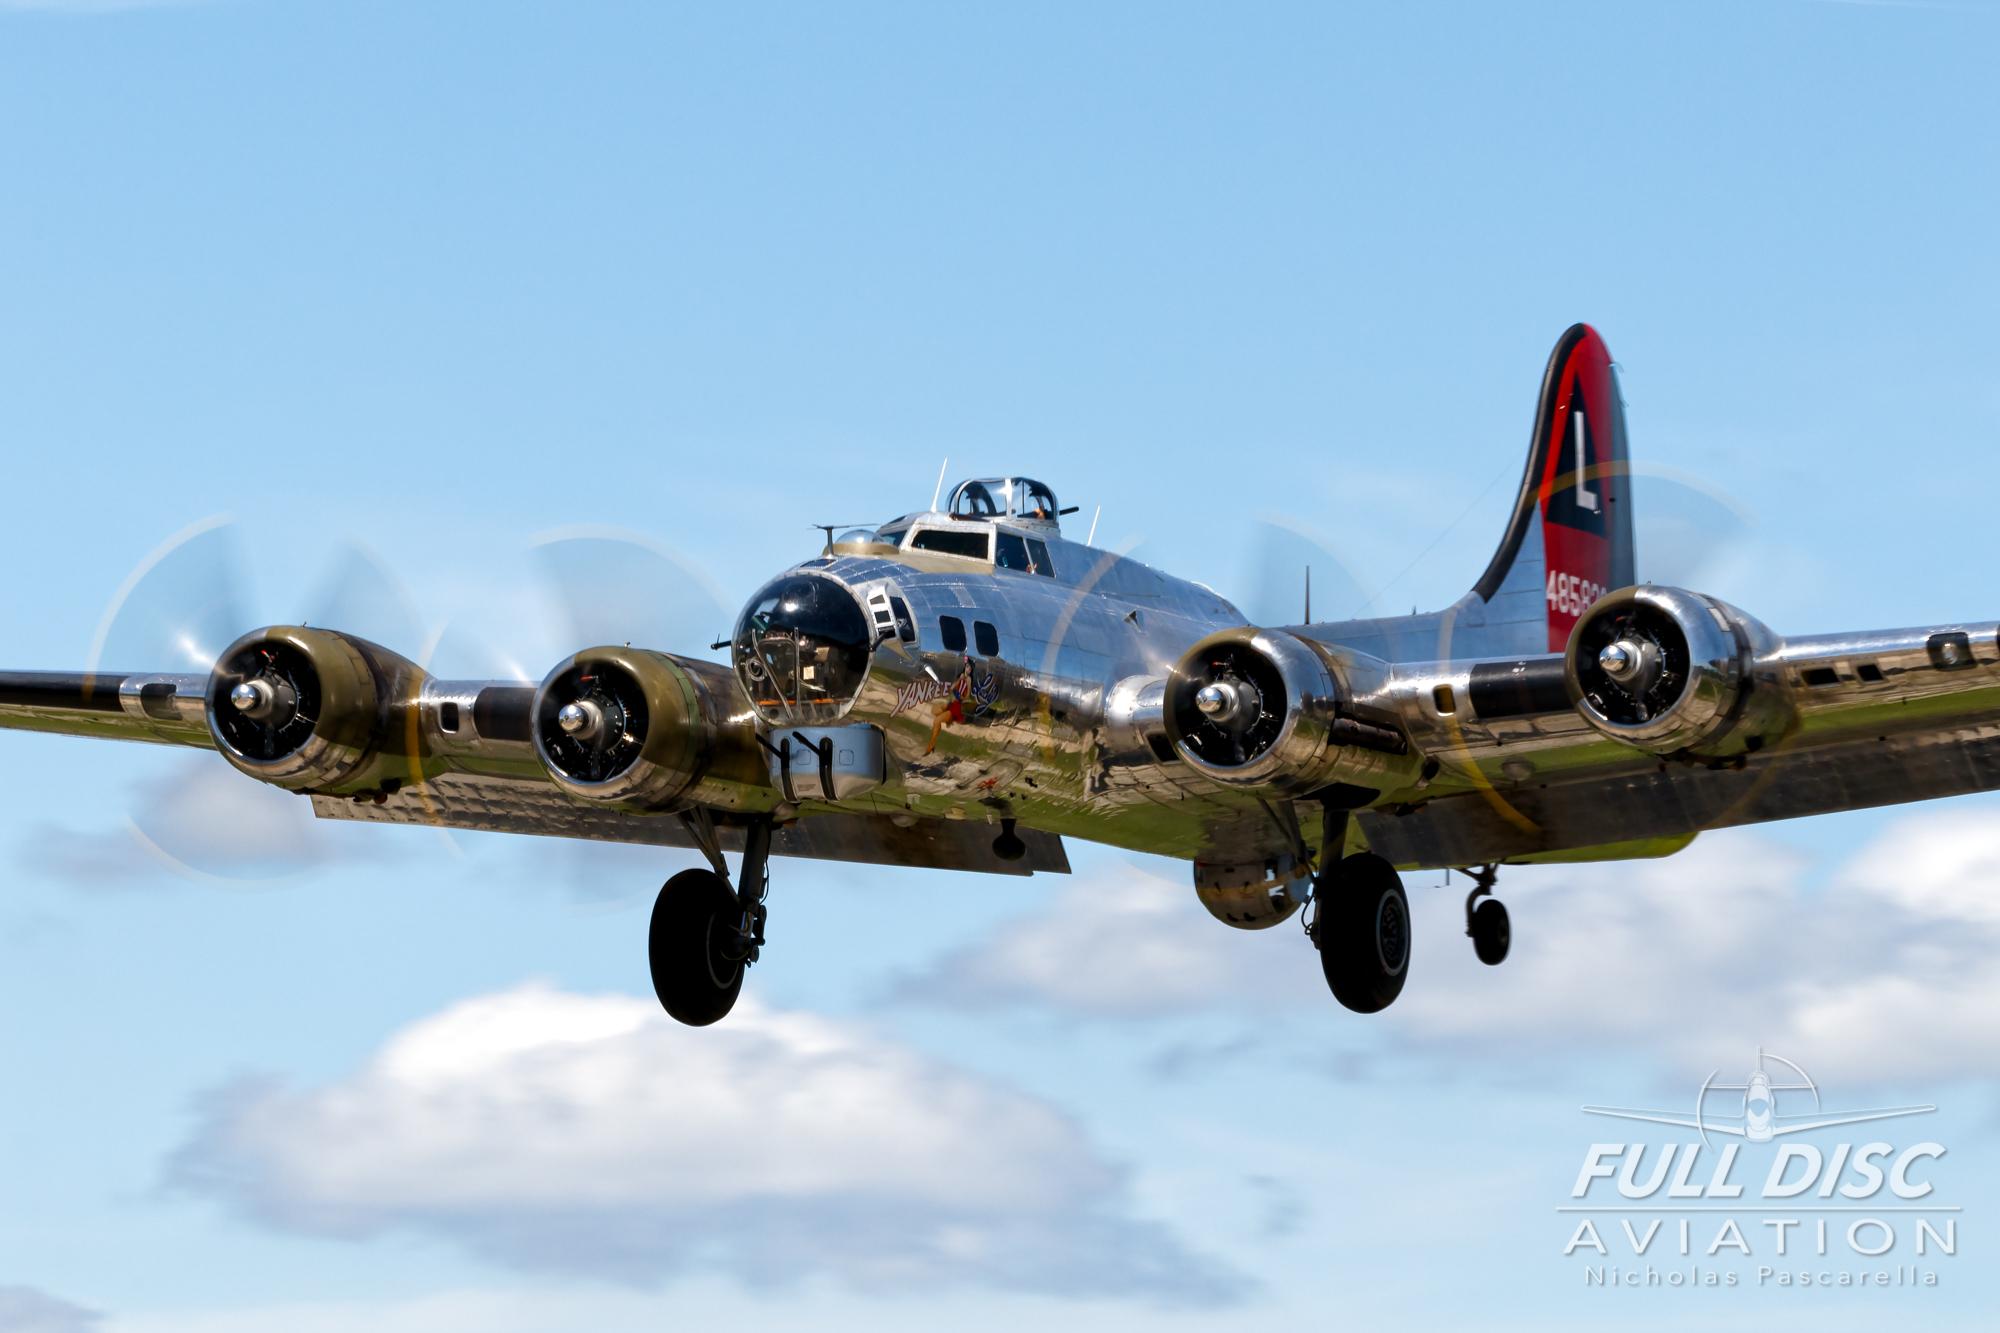 americanairpowermuseum_nicholaspascarella_nickpascarella_fulldiscaviation_legendsofairpower2019_aviation_warbird_b17_landing_flyingfortress_yankeelady.jpg